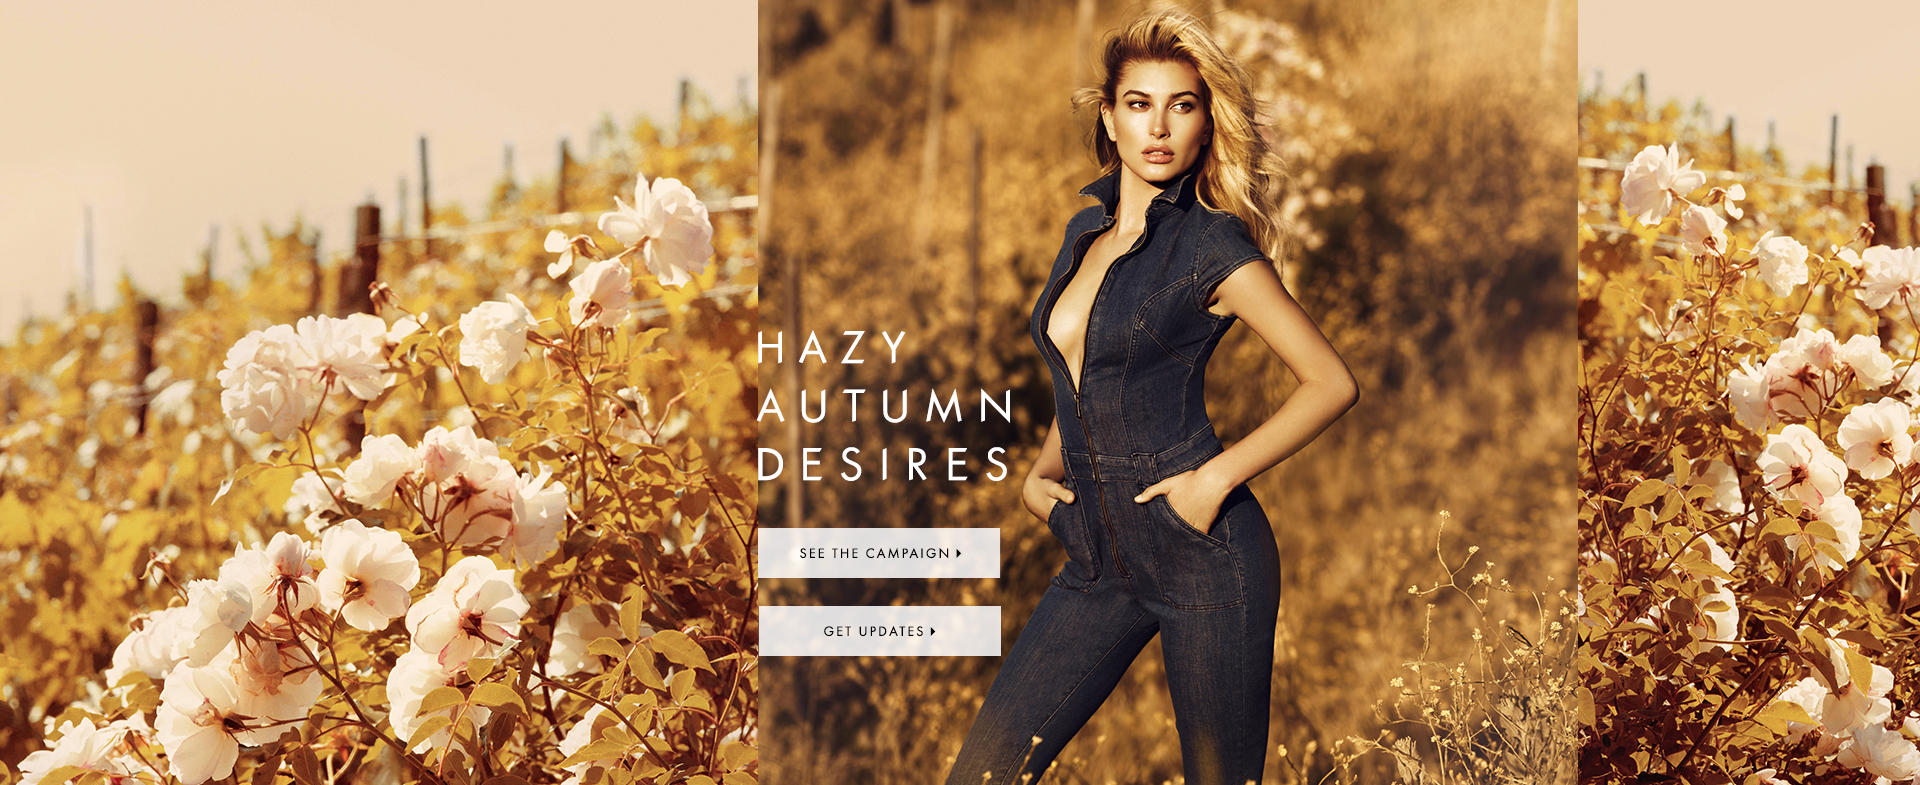 Hazy Autumn Desires